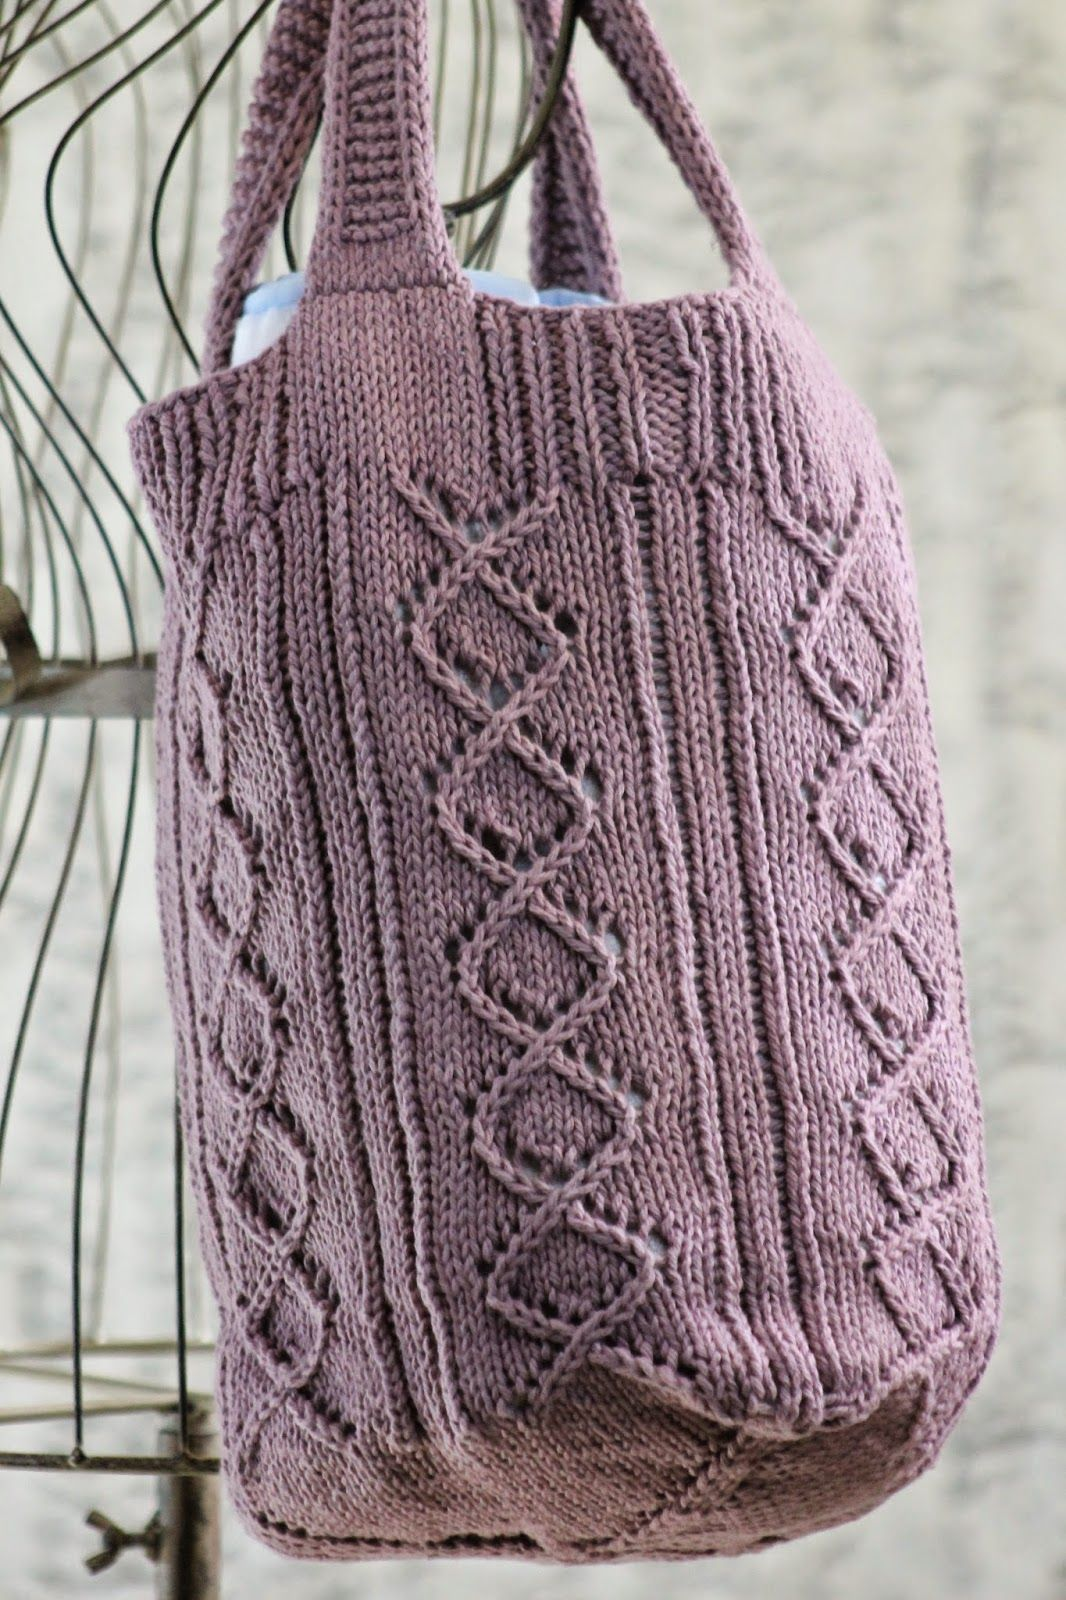 Rose Briar Bag | Knitted bags, Knitting, Pattern